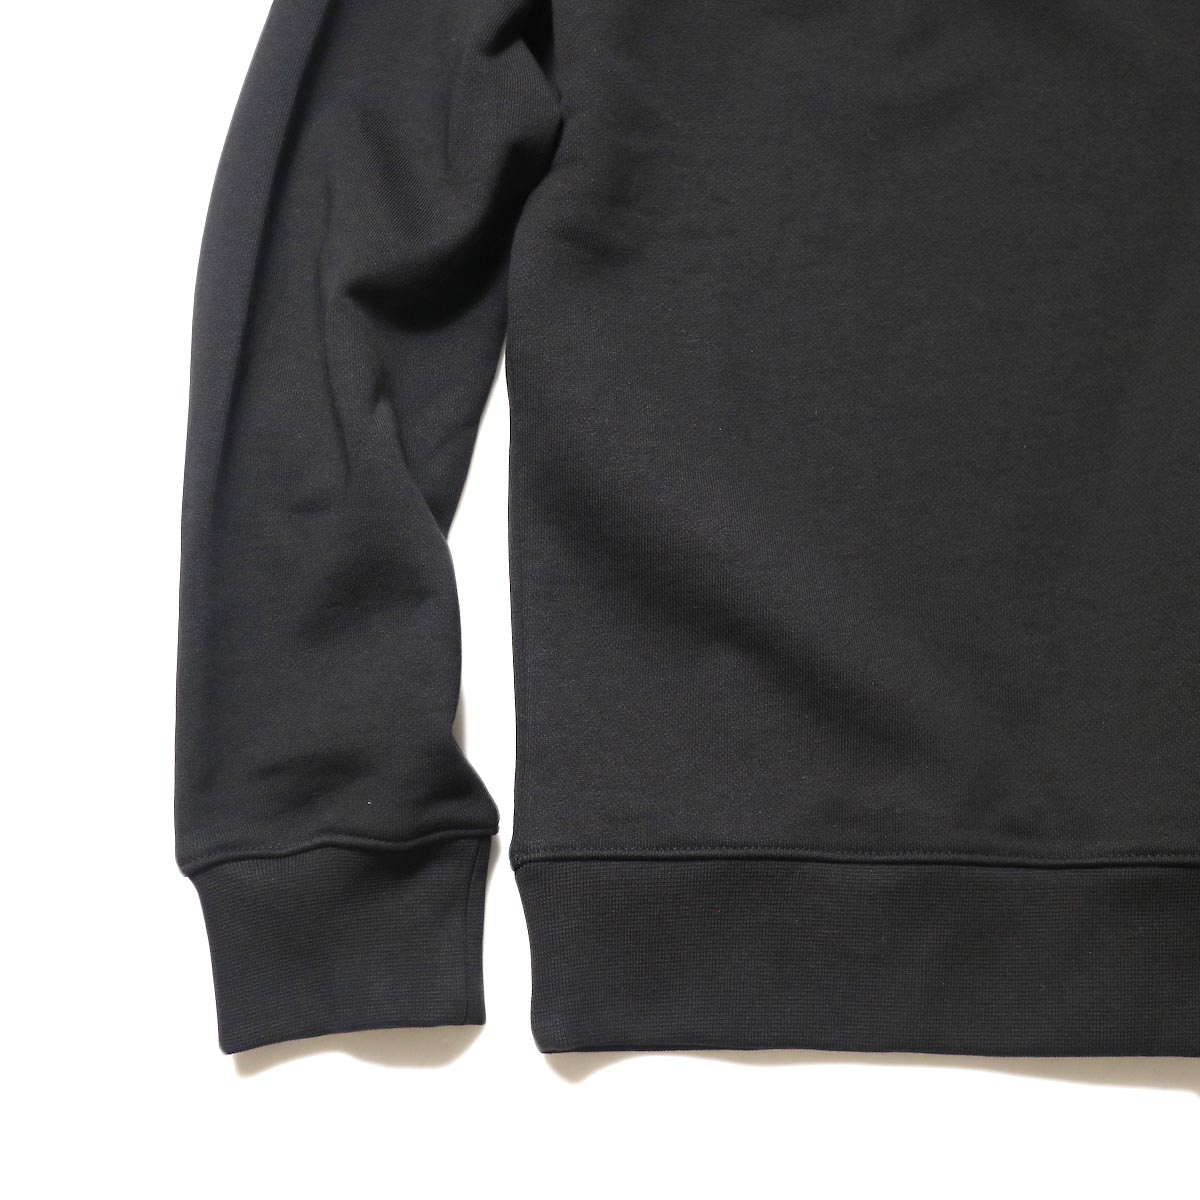 A.P.C. / VPC スウェットシャツ (black) 袖